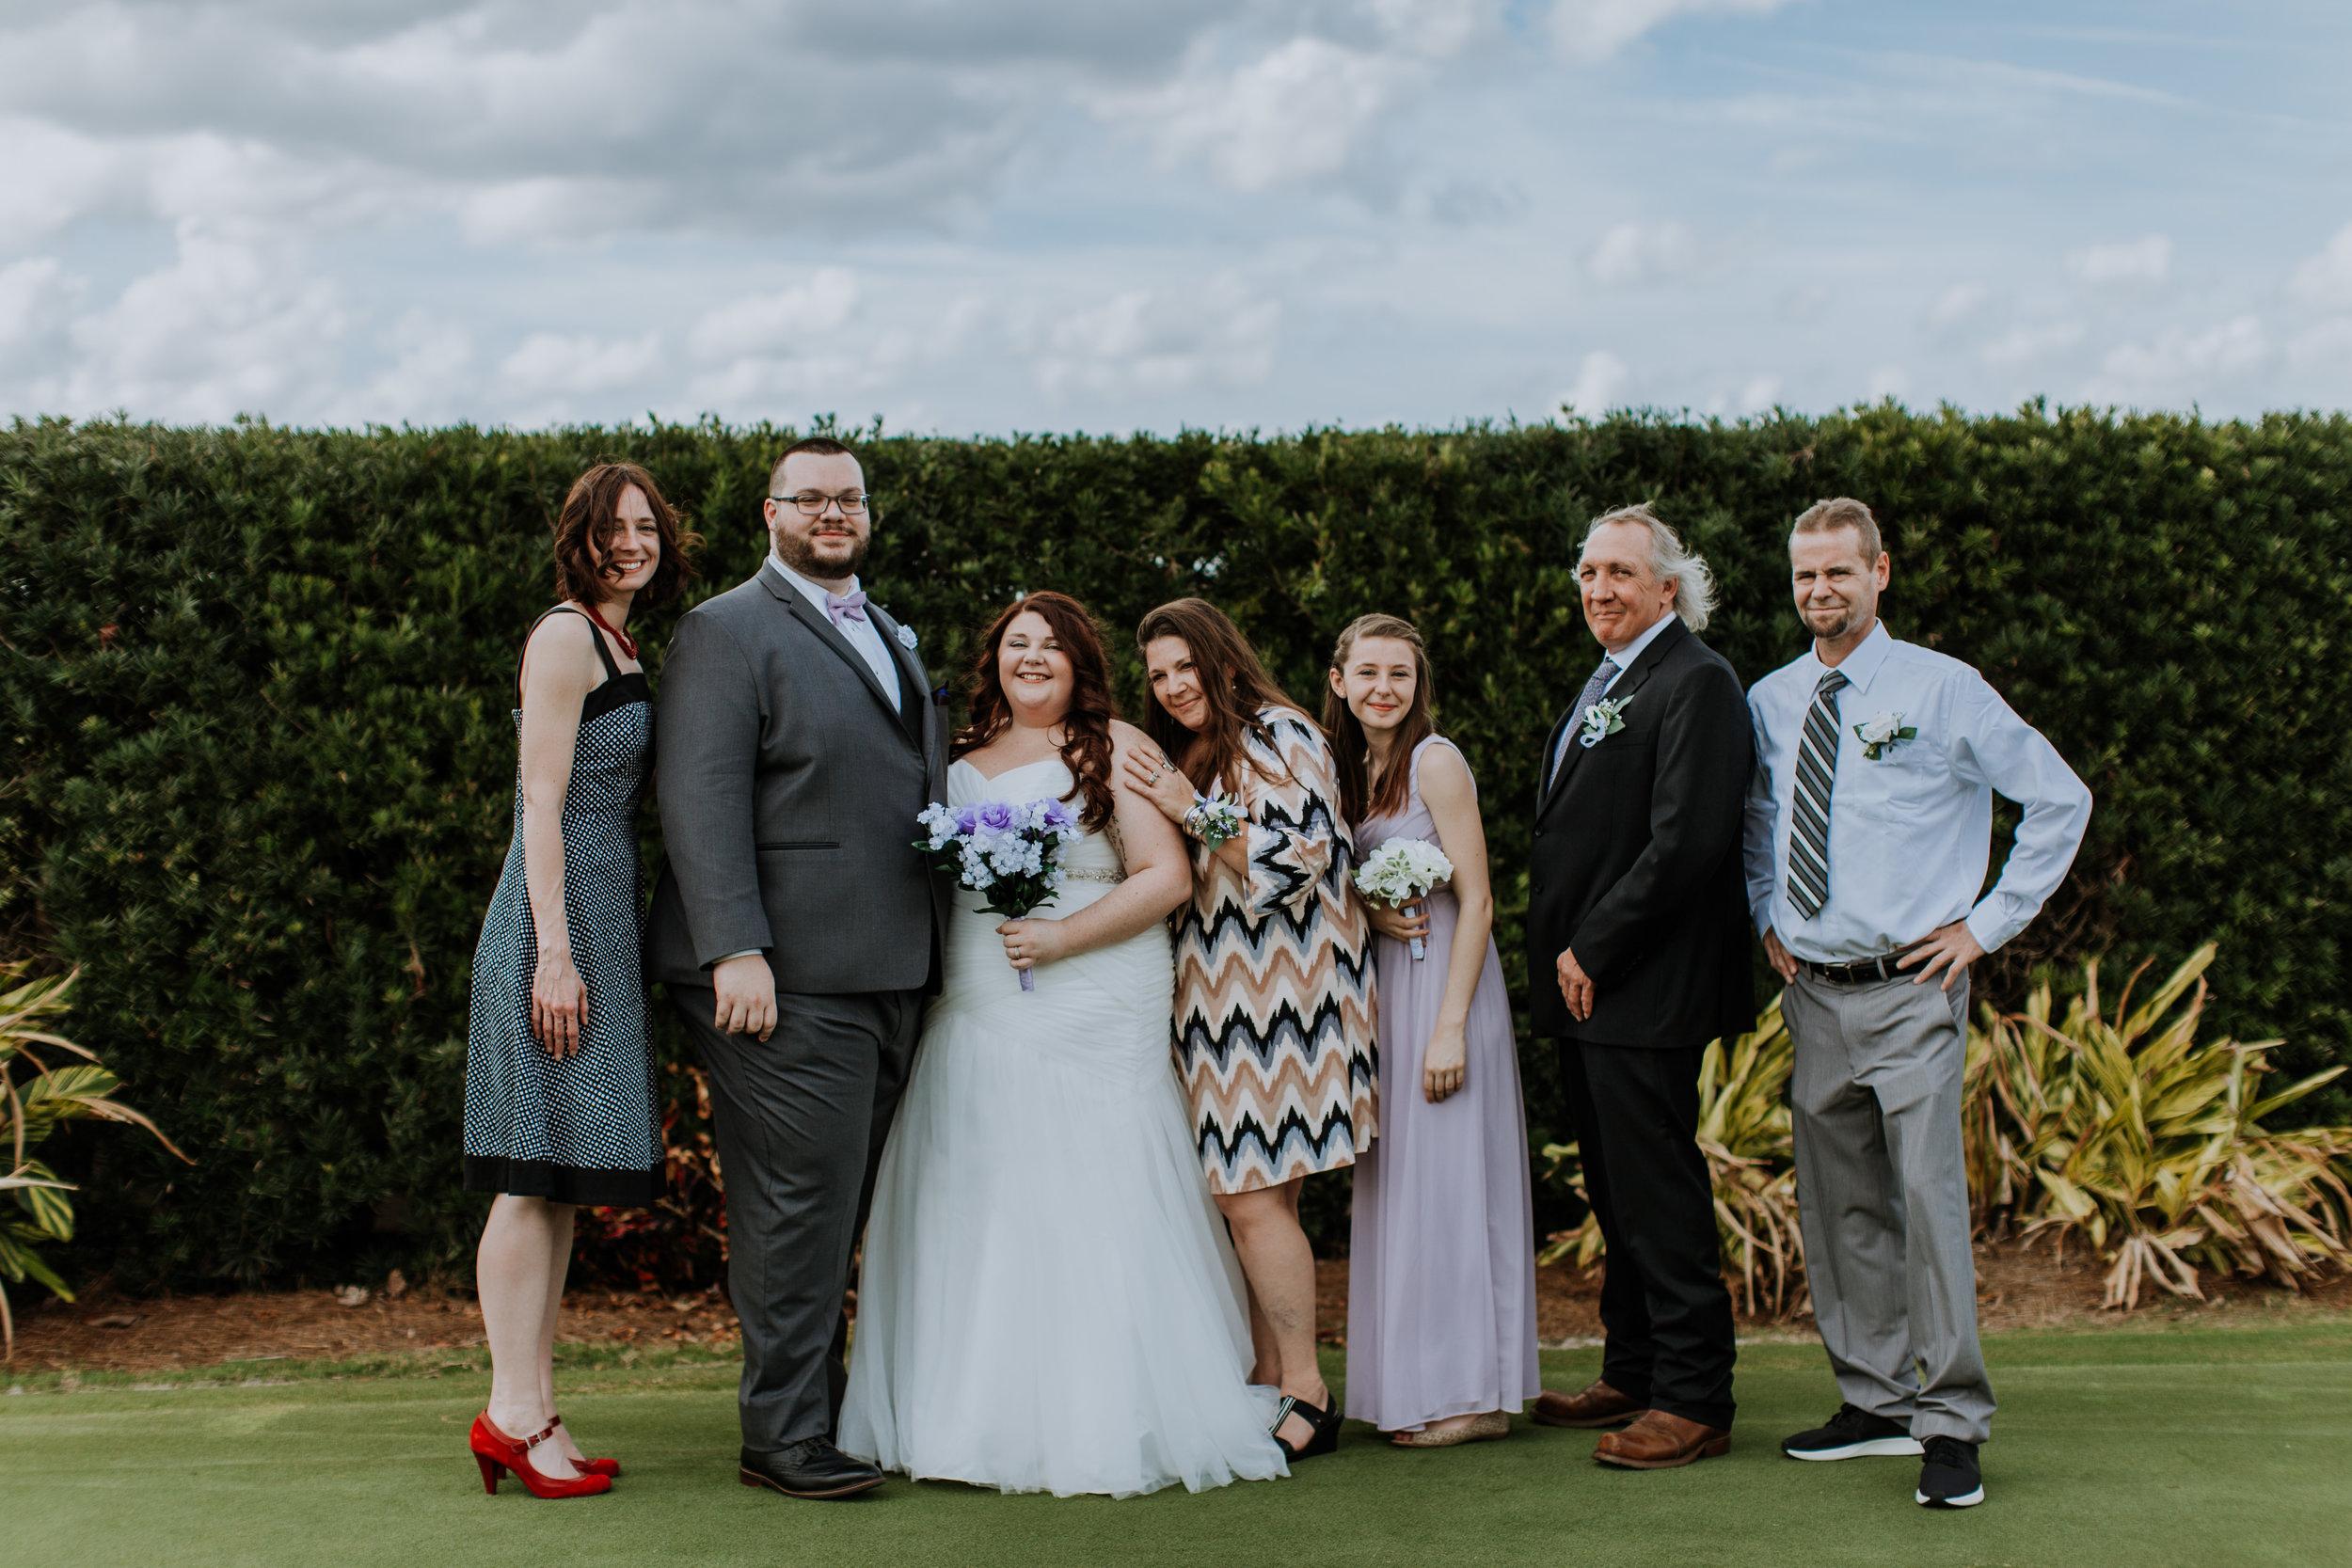 appolloni_new smyrna_wedding-271.jpg